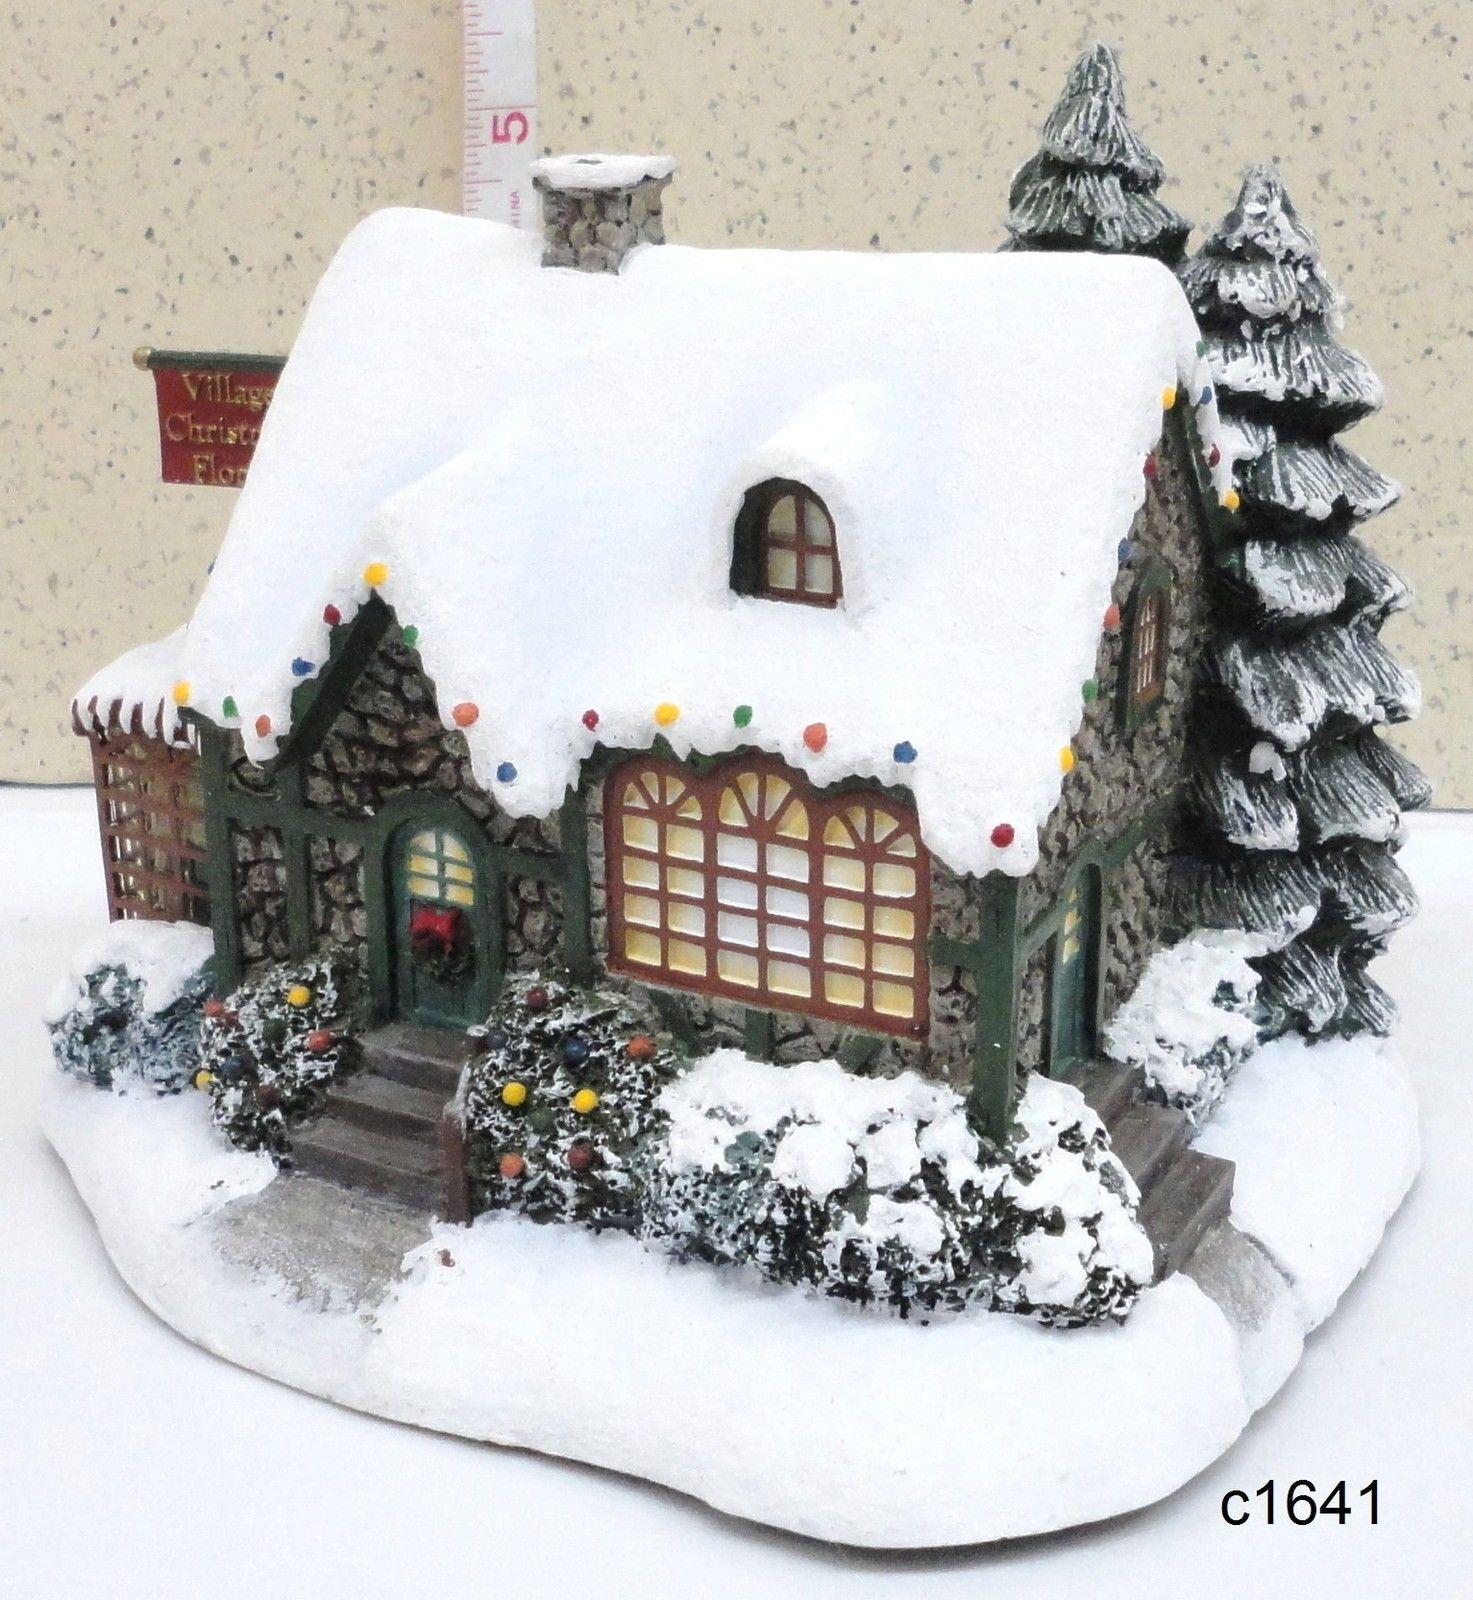 Thomas Kinkade Hawthorne VILLAGE CHRISTMAS FLORIST Shop Lighted ...